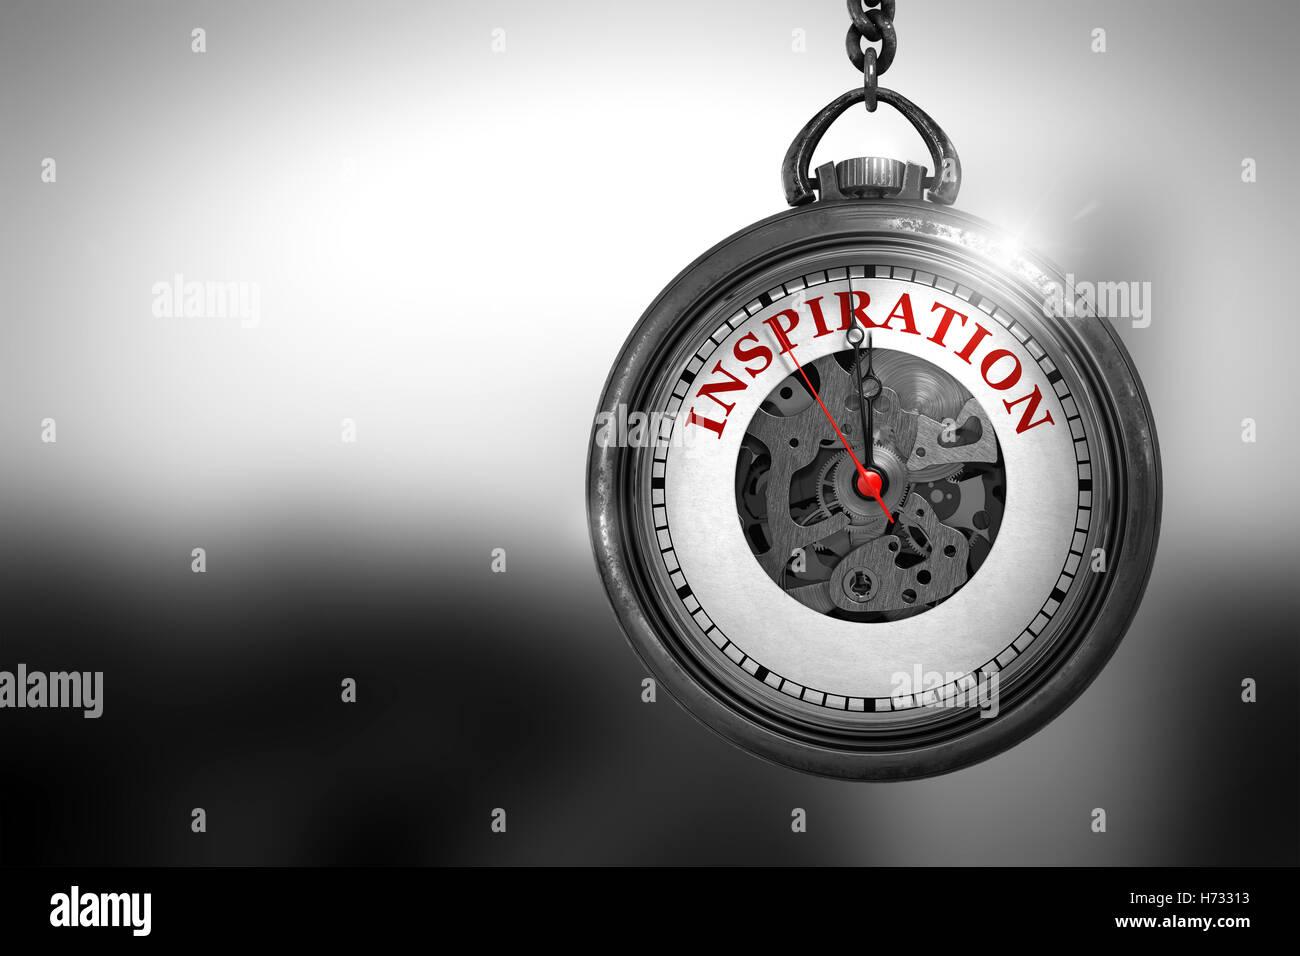 Inspiration on Pocket Watch. 3D Illustration. - Stock Image